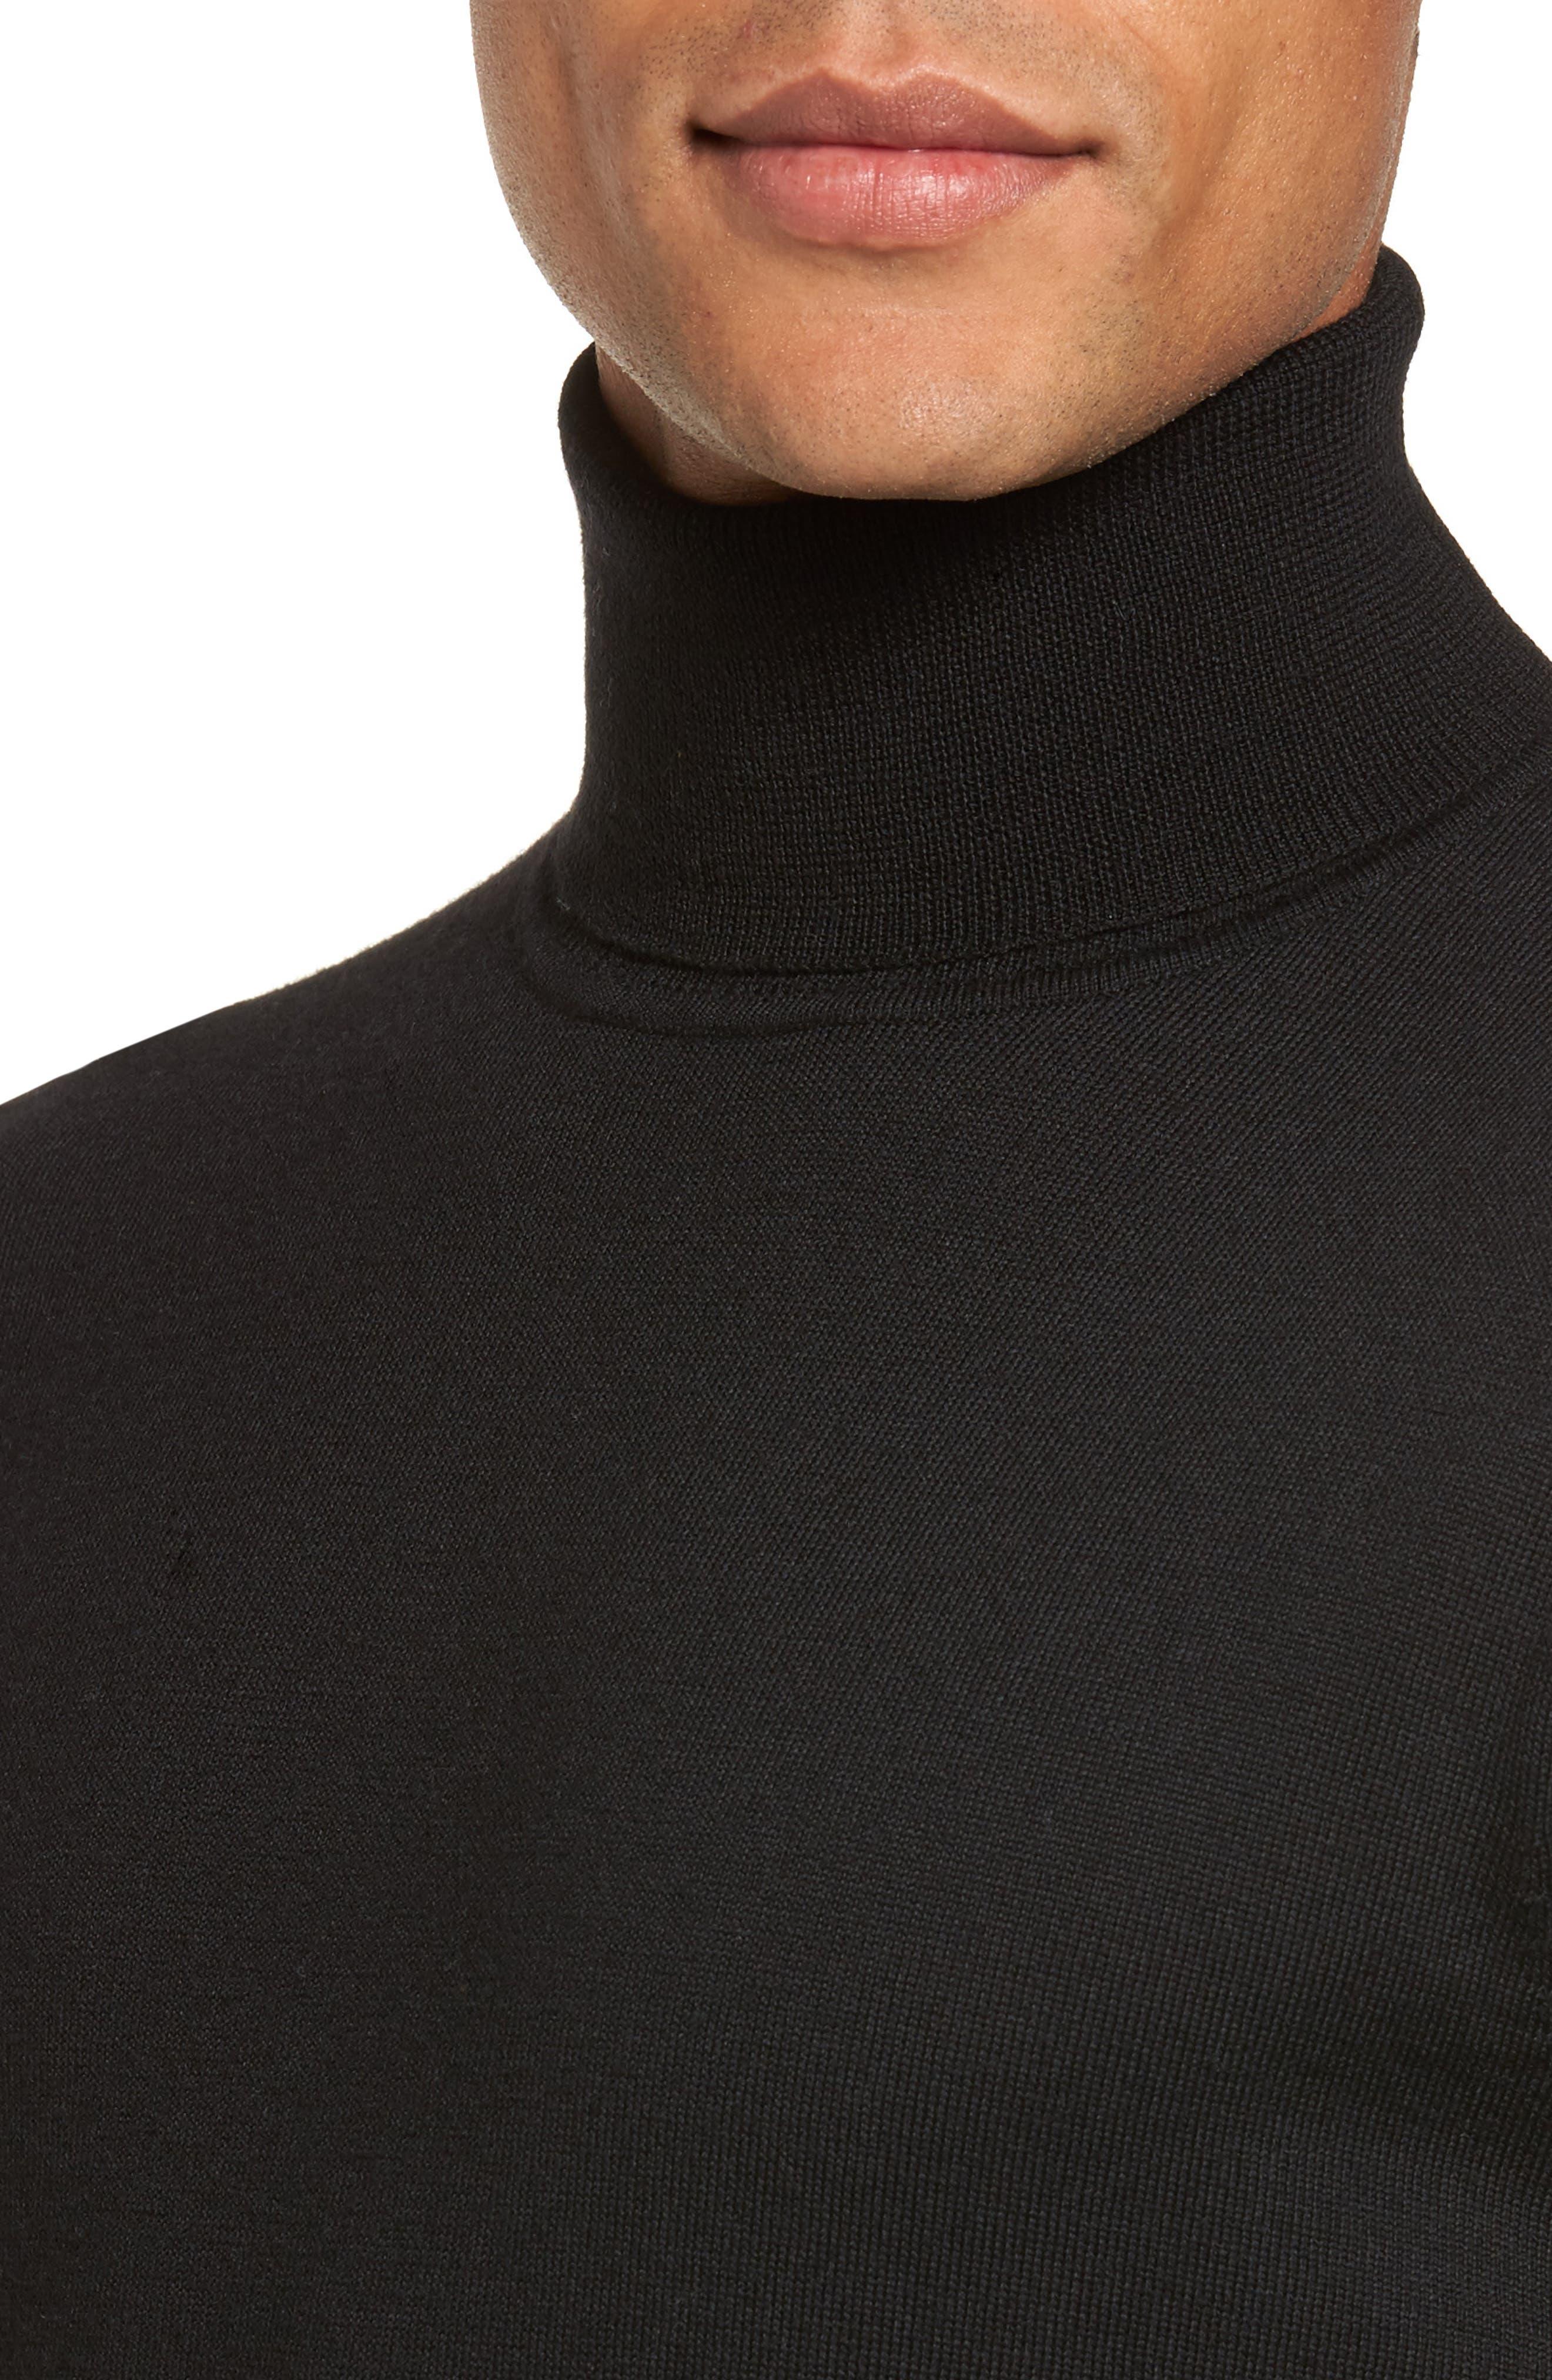 Merino Wool Turtleneck Sweater,                             Alternate thumbnail 4, color,                             BLACK CAVIAR